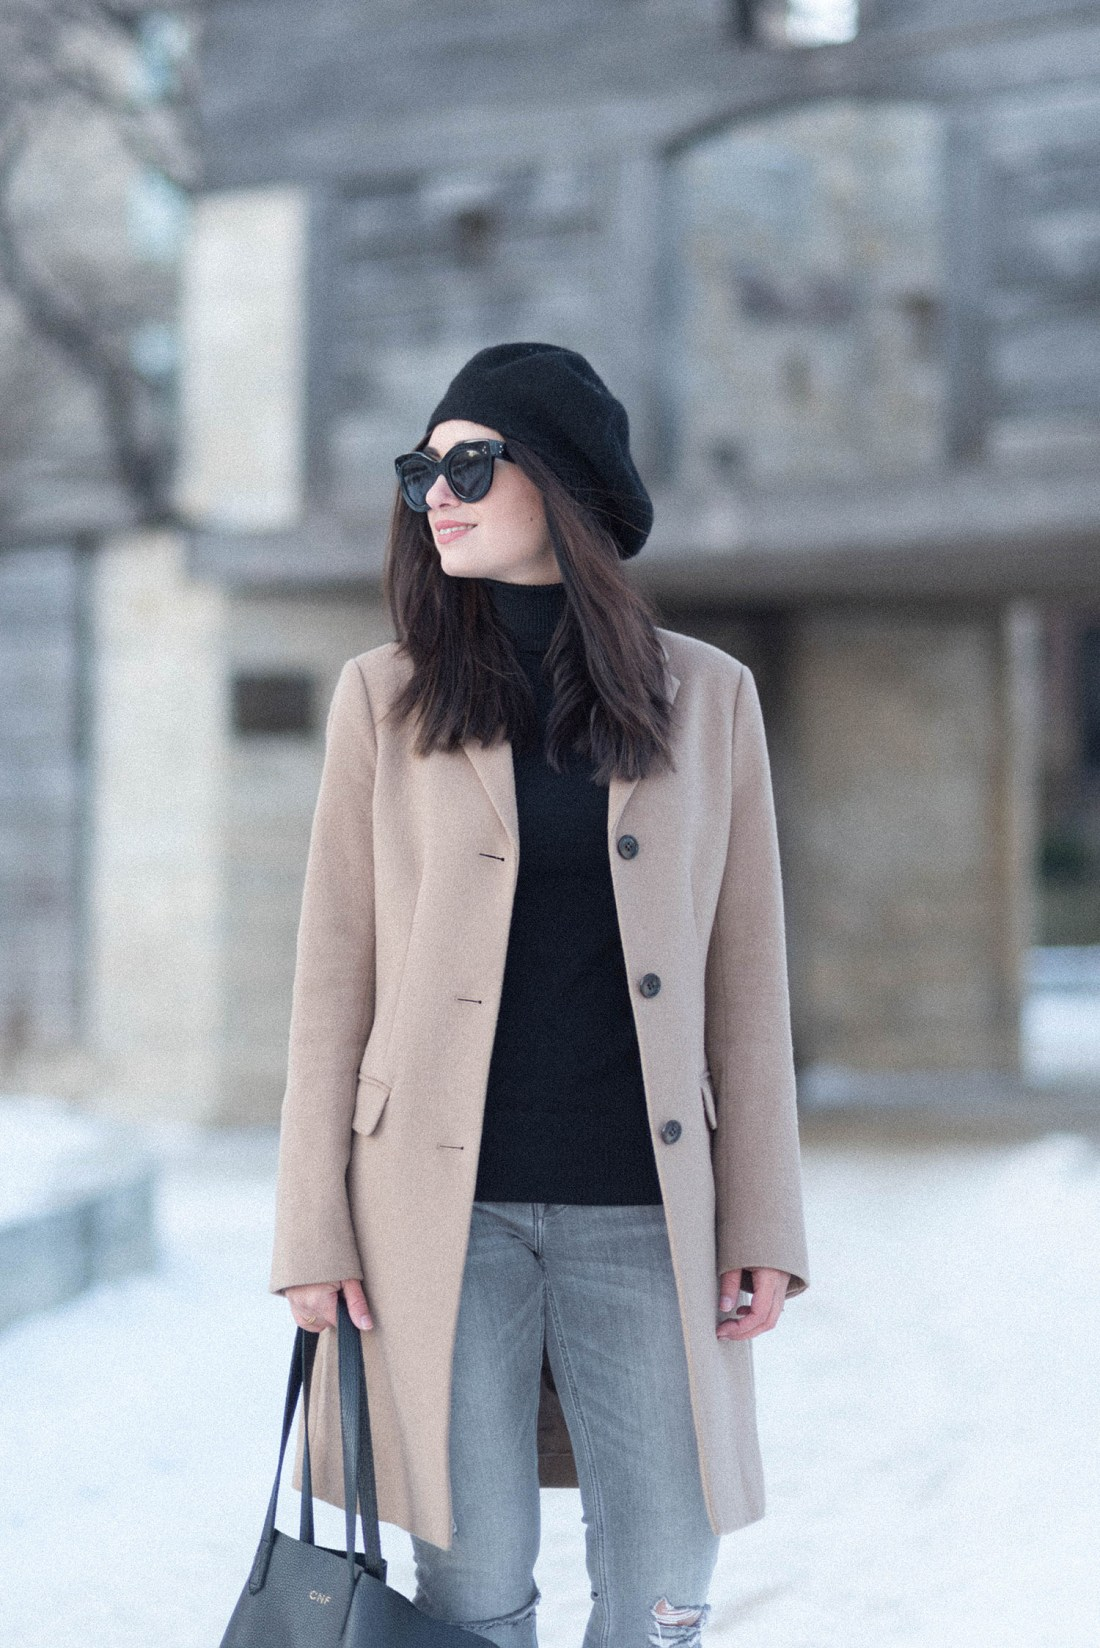 Portrait of Winnipeg fashion blogger Cee Fardoe at Fort Garry wearing Celine Audrey sunglasses and an Anthropologie Bonnie beret